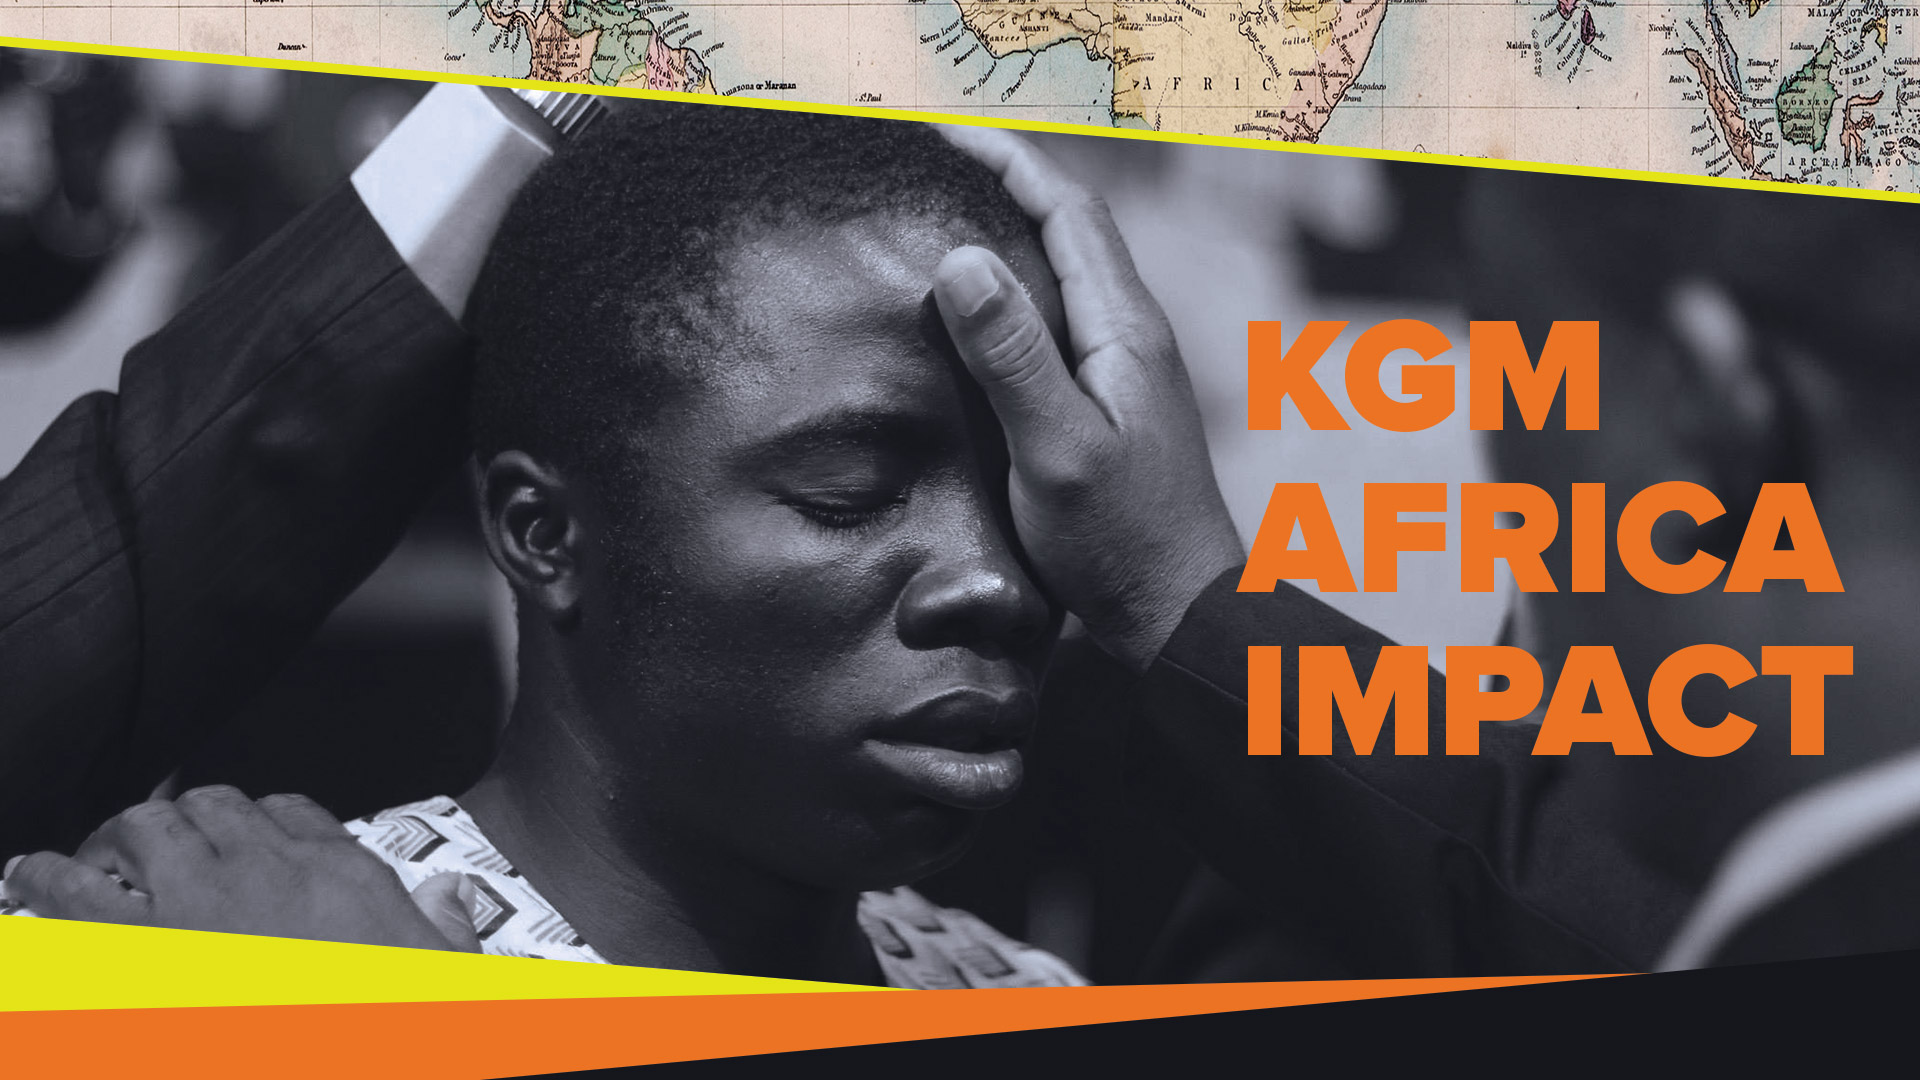 africa-impact2016.jpg